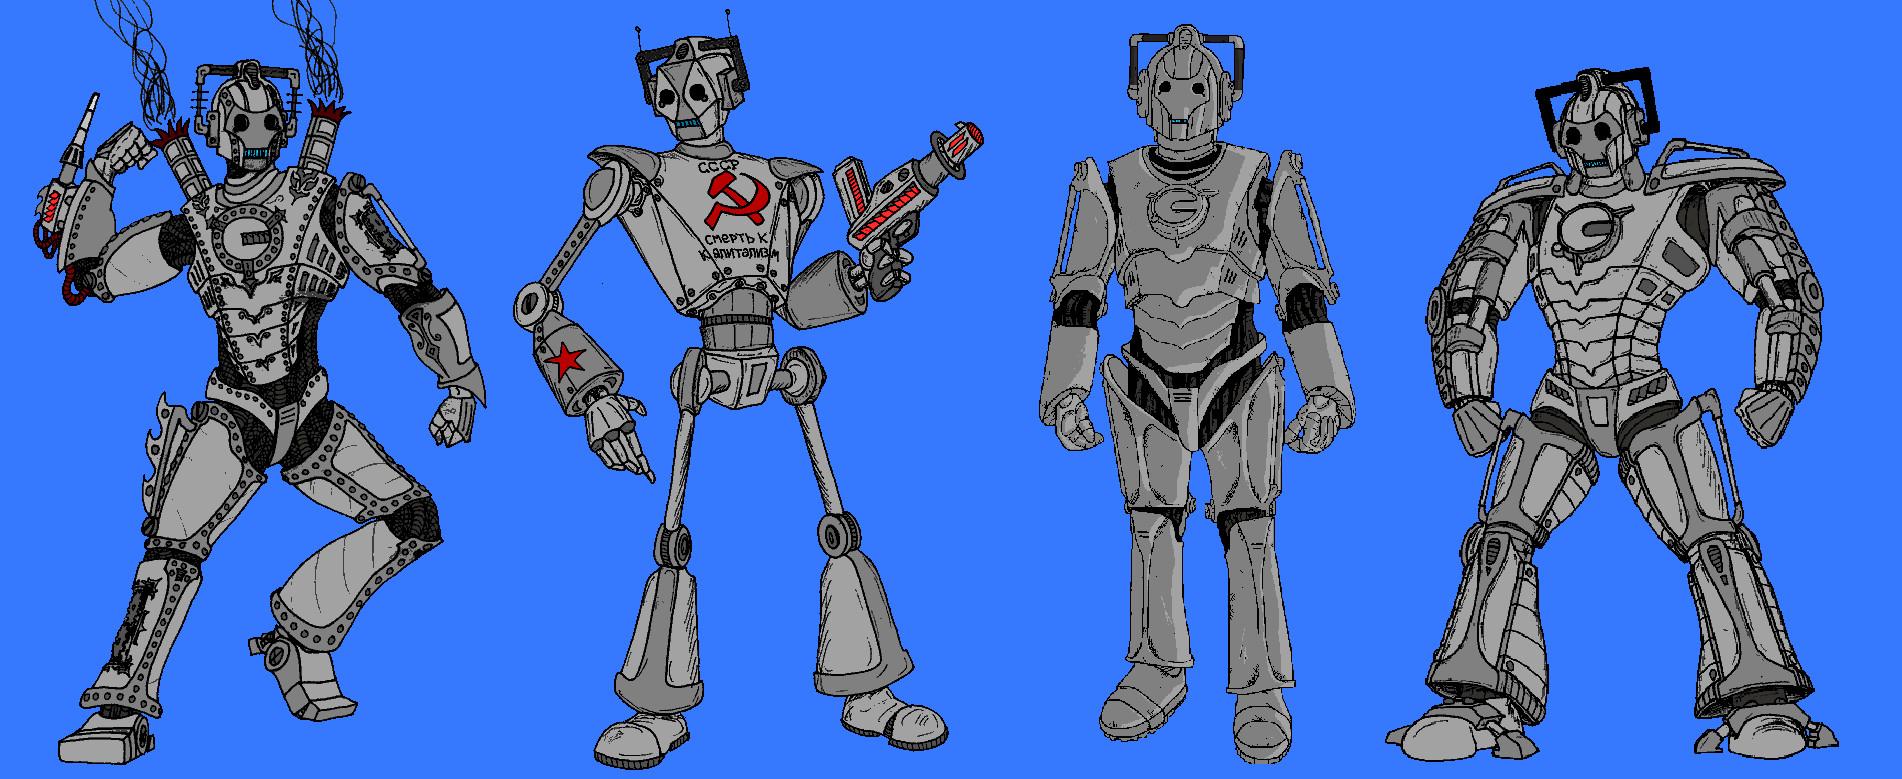 Evolution Of The Cybermen Cybermen Evolution Pic...